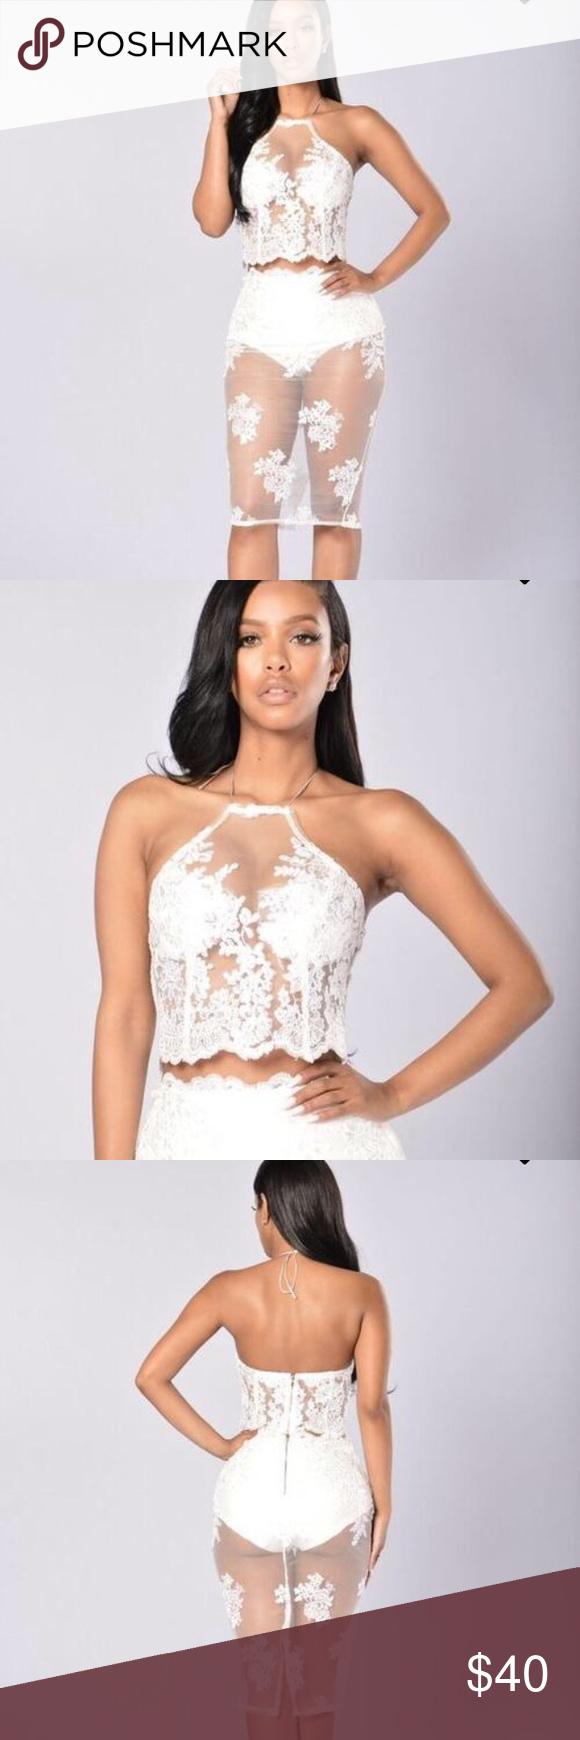 2 Piece Set Beautiful White Lace 2 Piece Set Perfect For A Special Occasion Fashion Nova Other Fashion Clothes Design Fashion Design [ 1740 x 580 Pixel ]